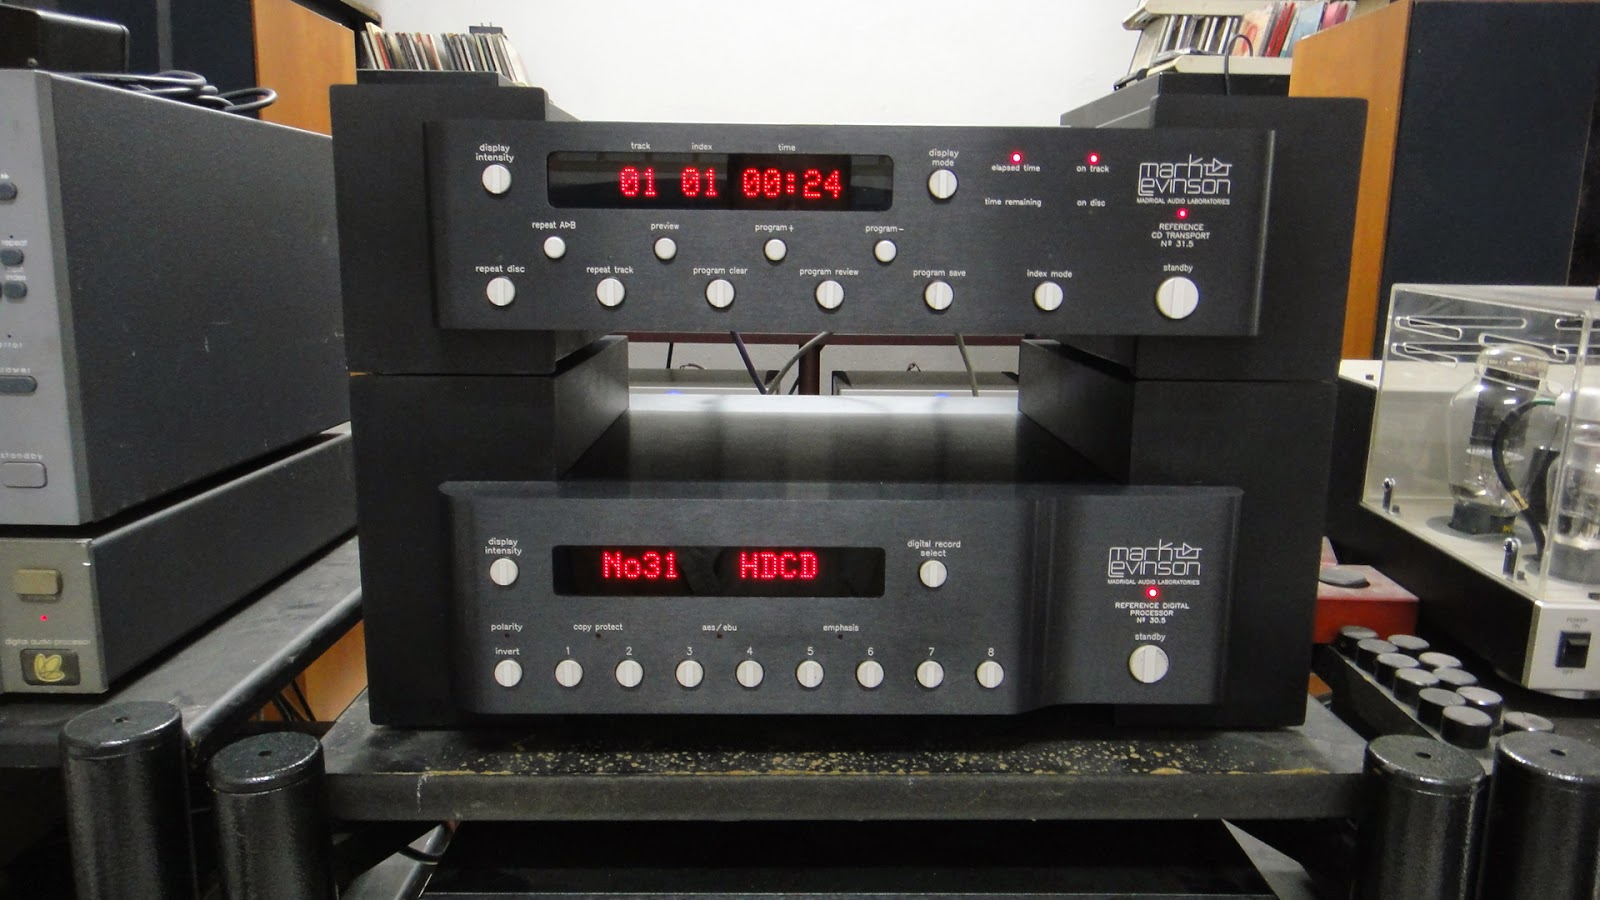 Loy hifi mark levinson no 31 5 cd transport amp no 30 5 dac used sold